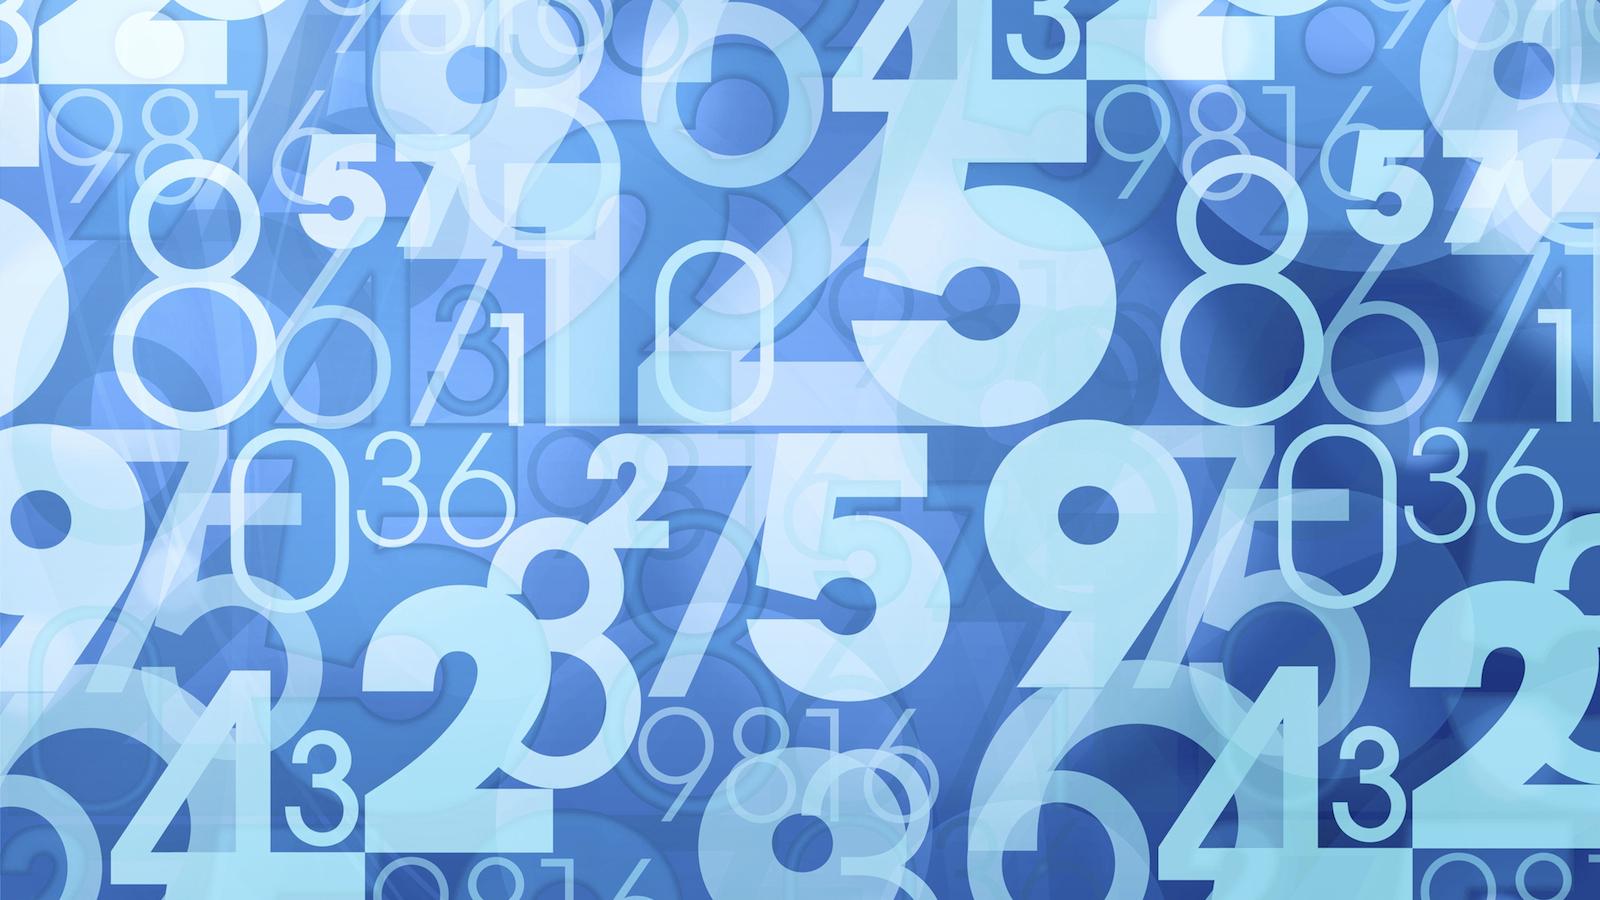 Гематрия — что зашифровано в имени человека